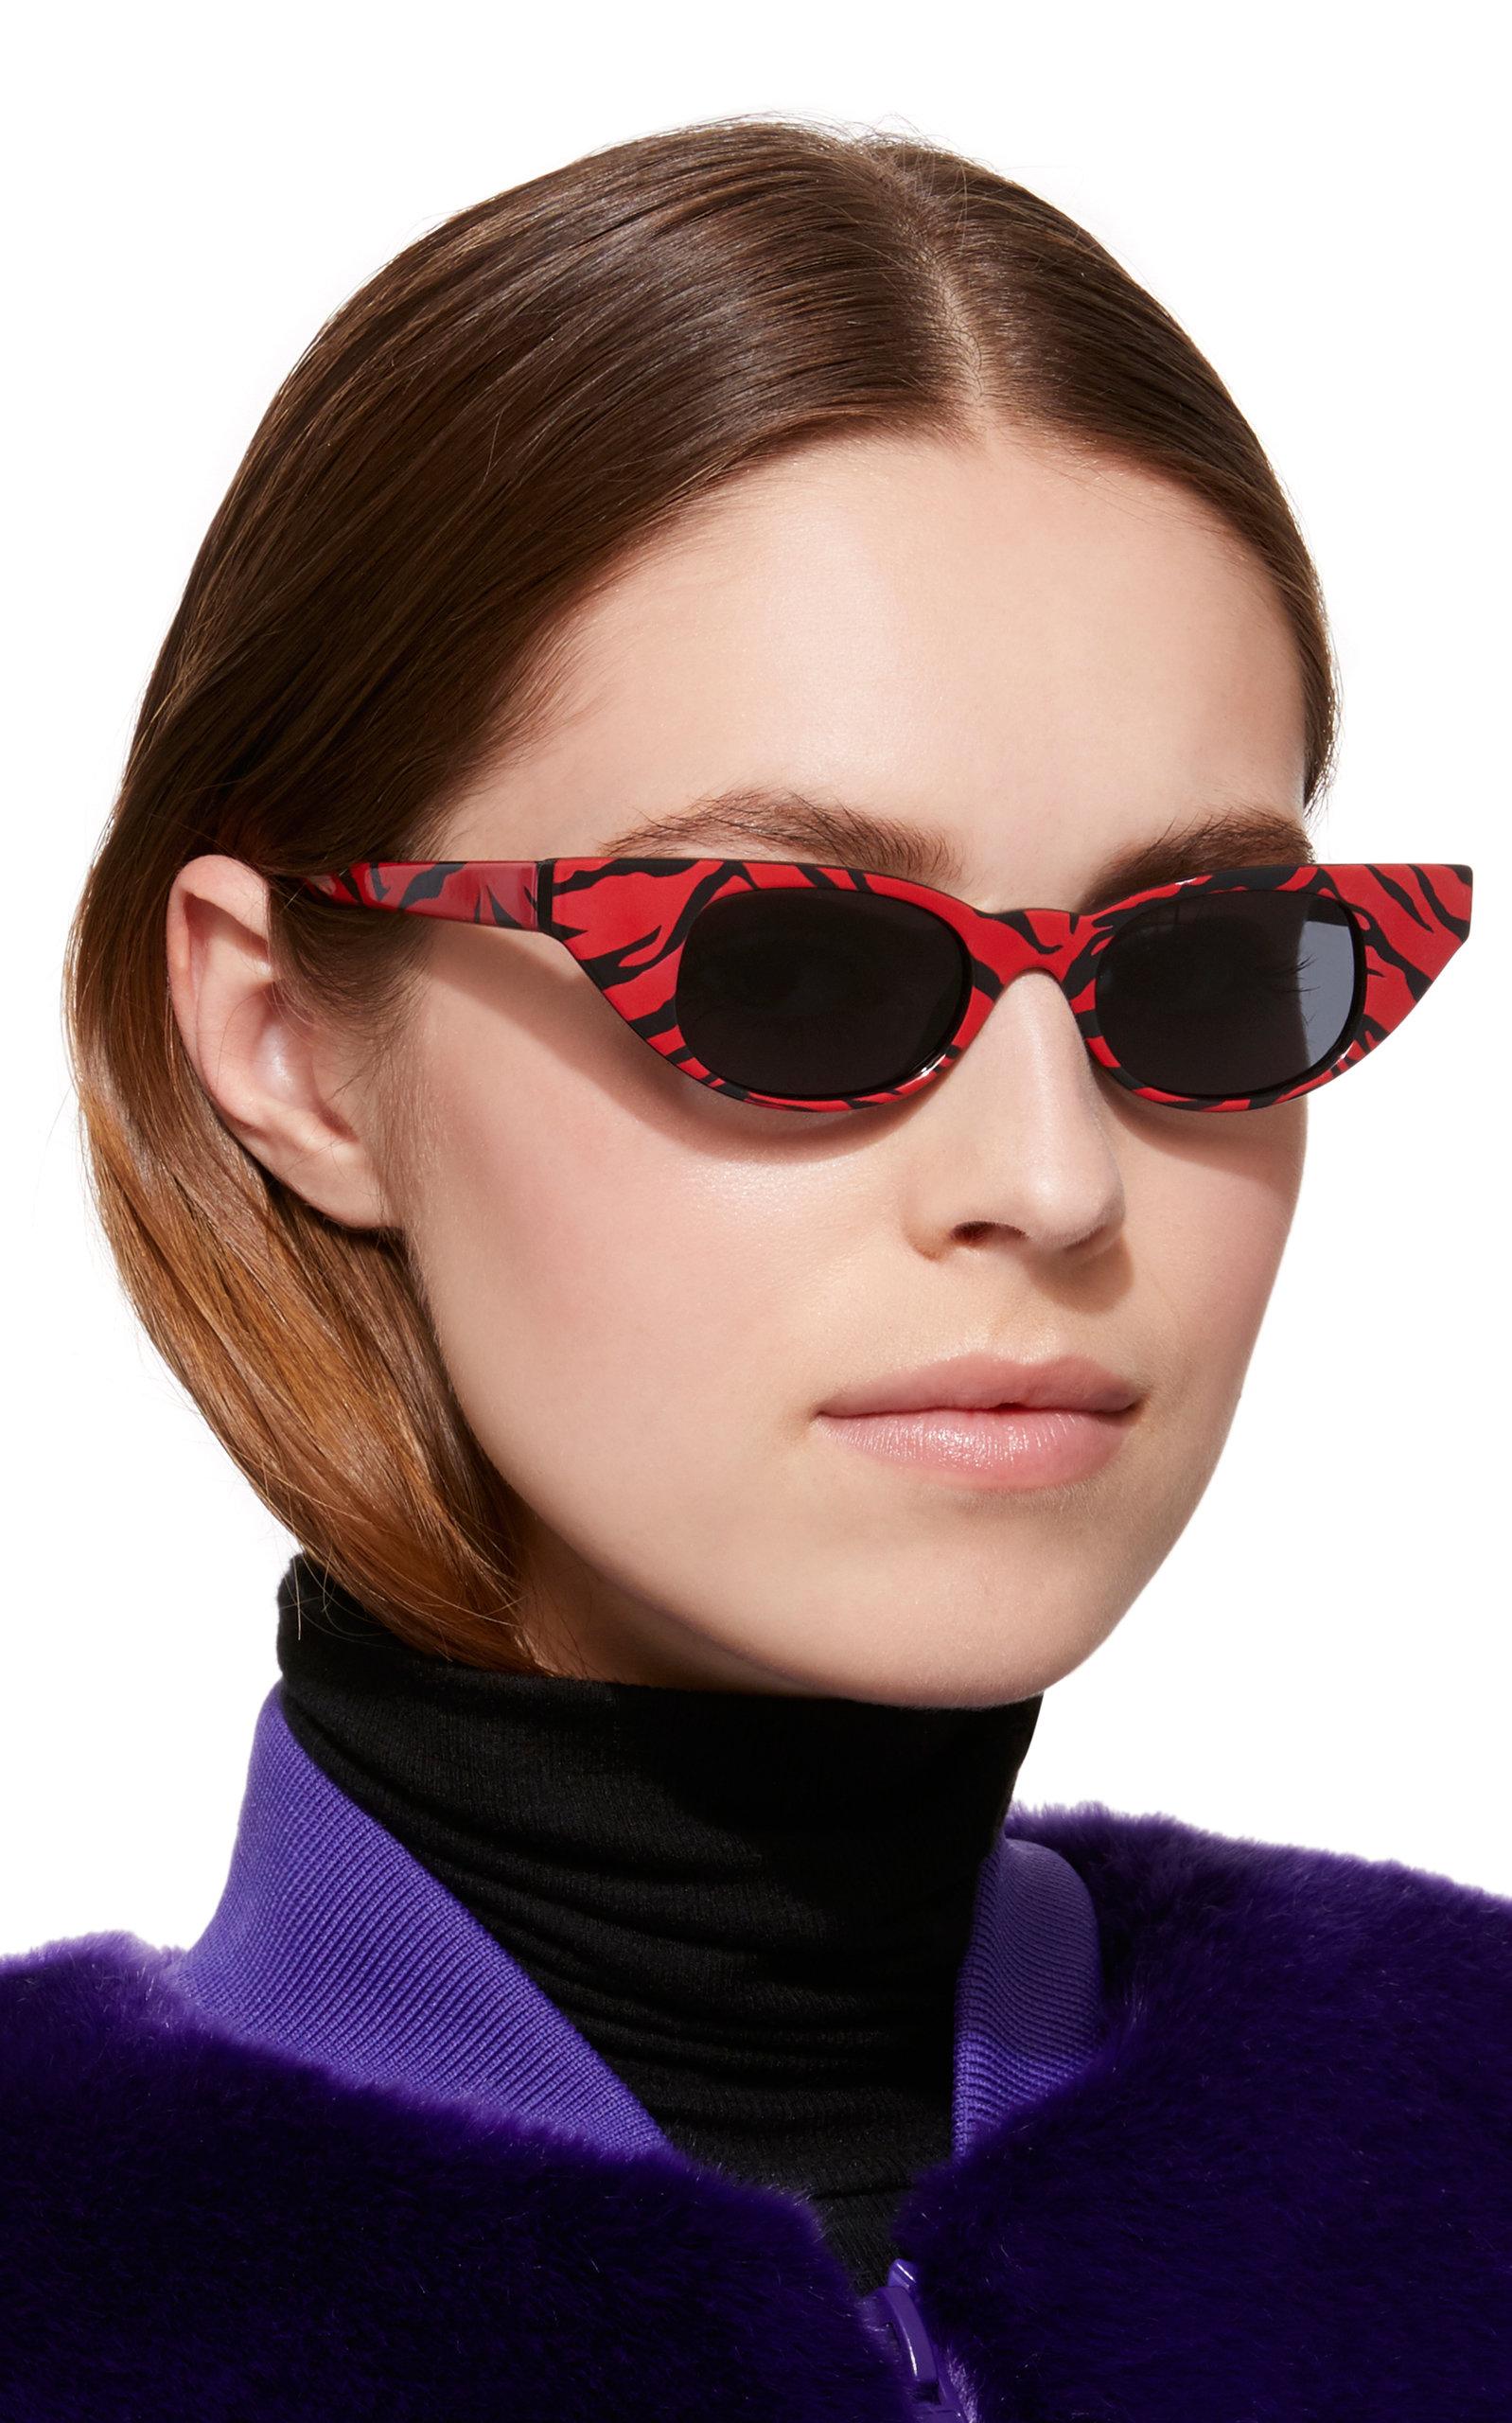 386d281d264d0 The Breaker Sunglasses by Adam Selman X Le Specs